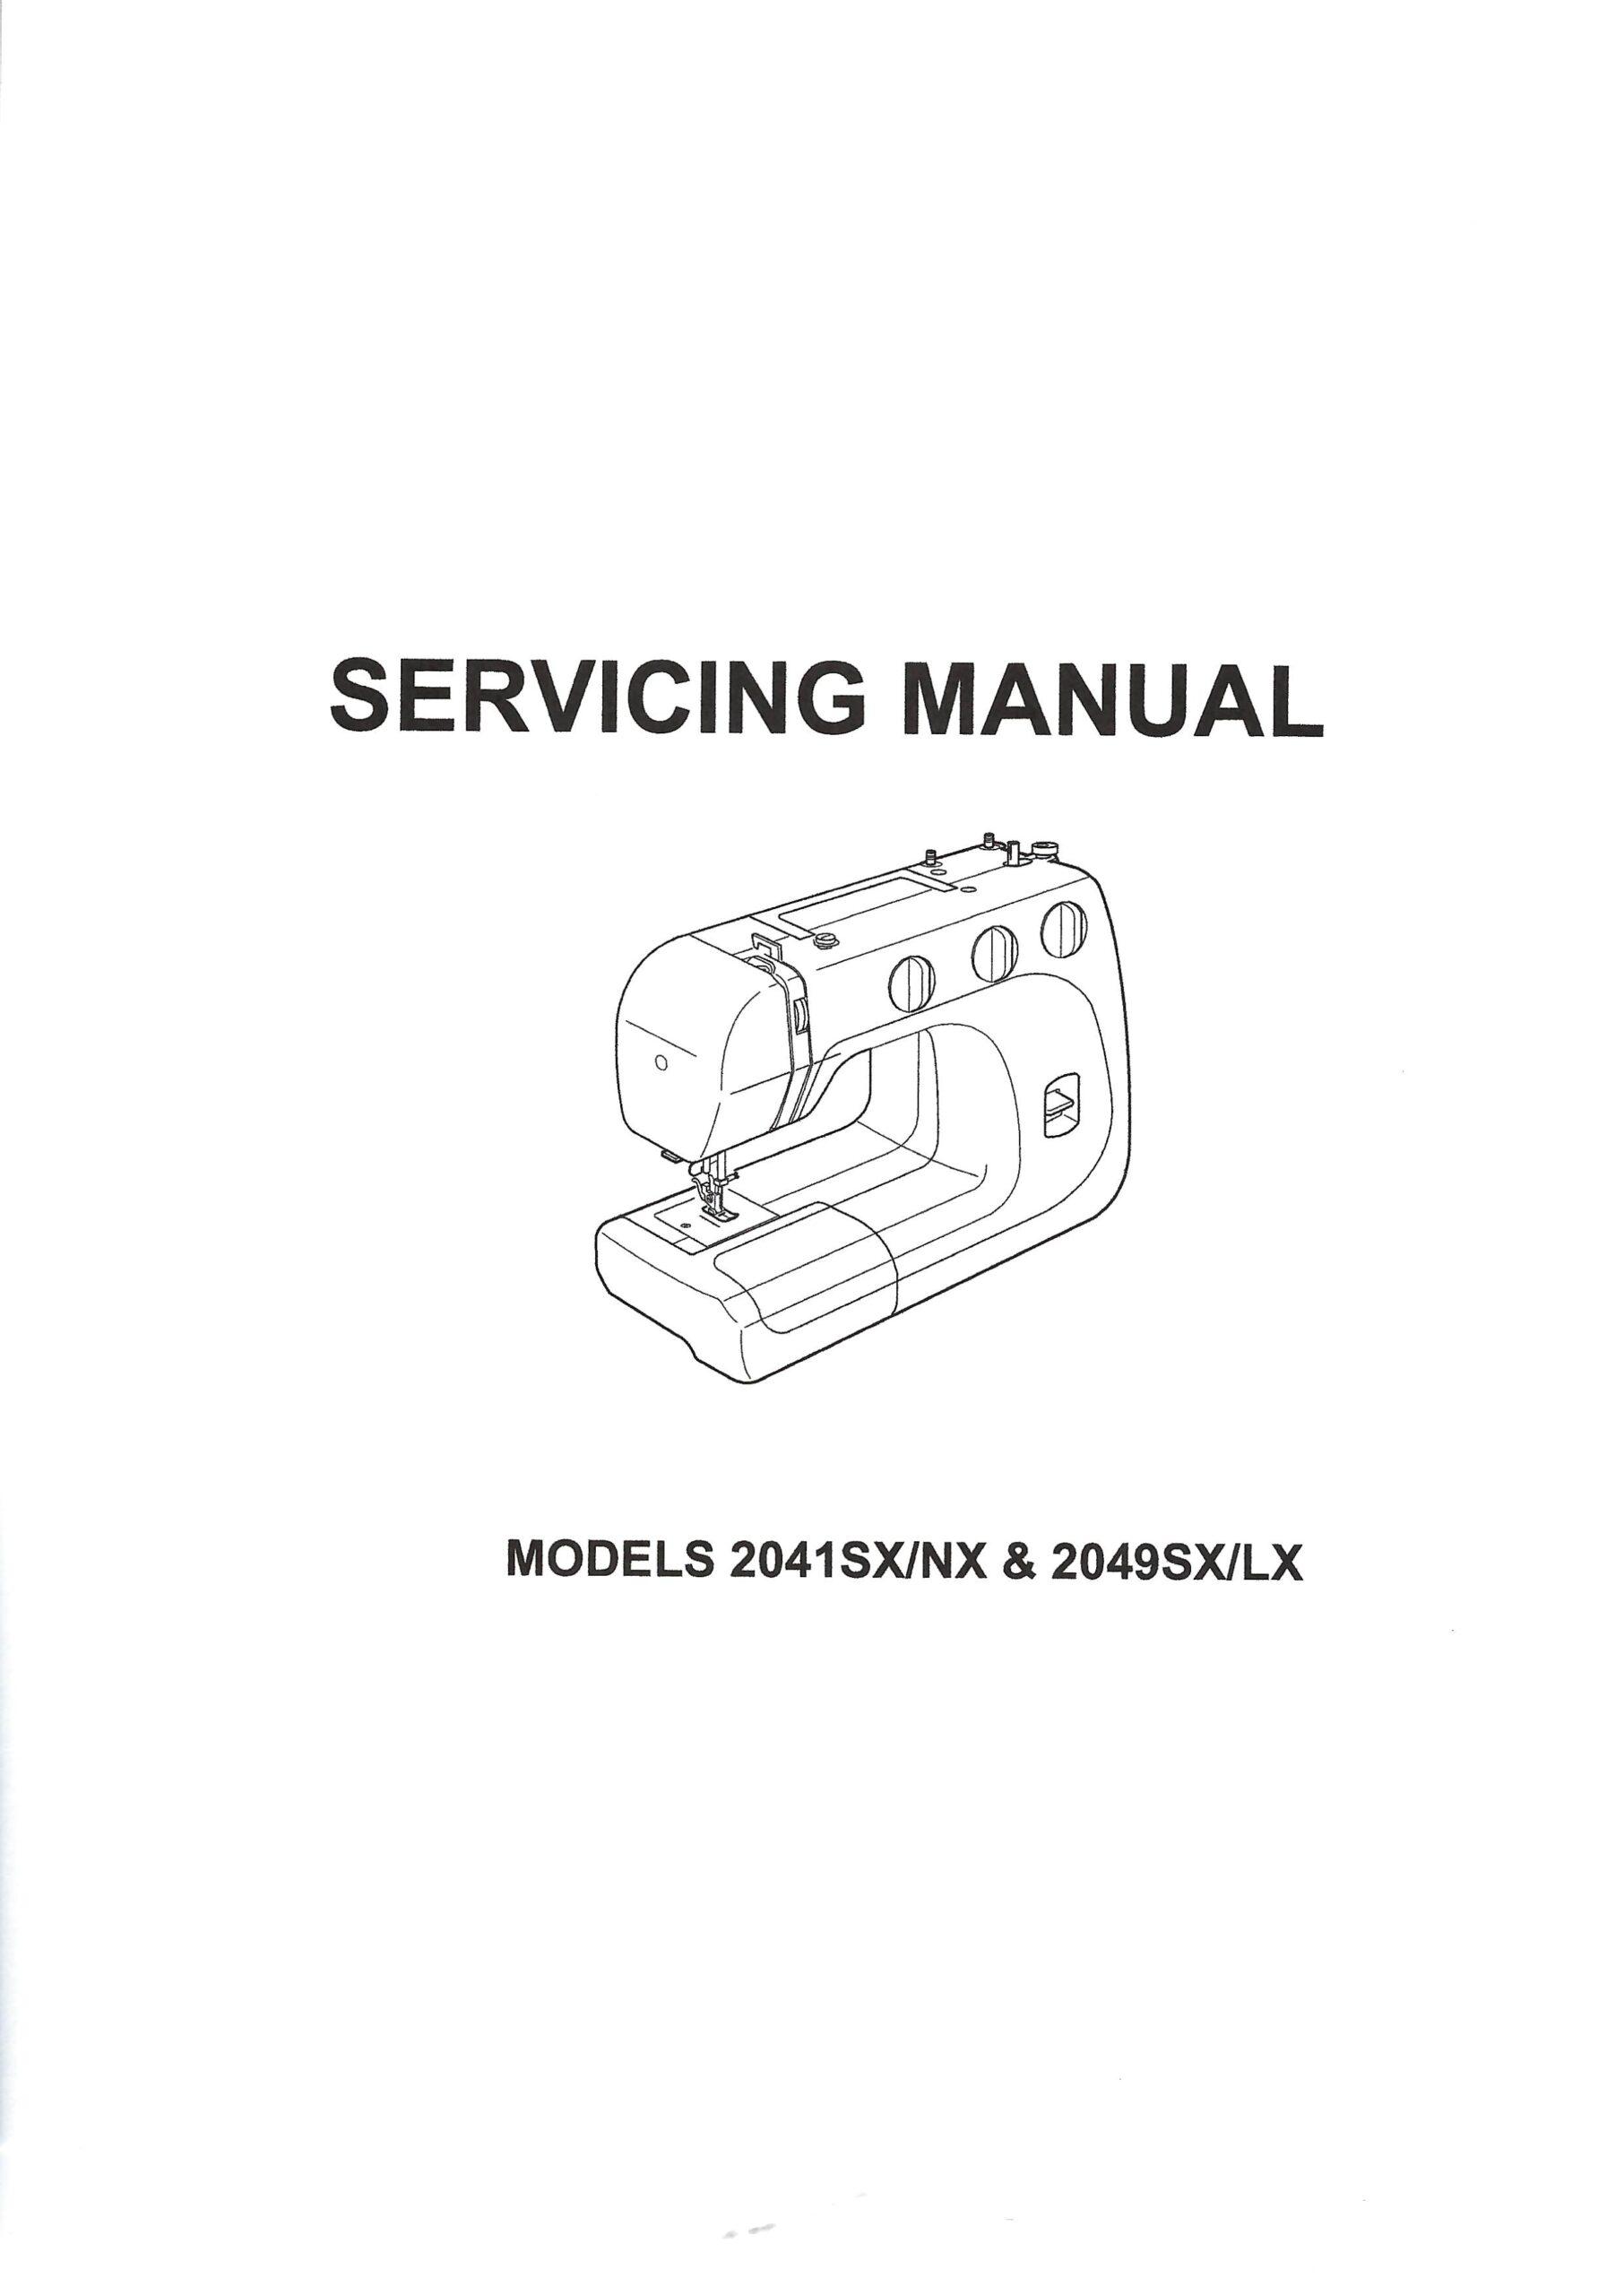 Service Manual Janome 2041SX/NX, 2049SX/NX Series Sewing